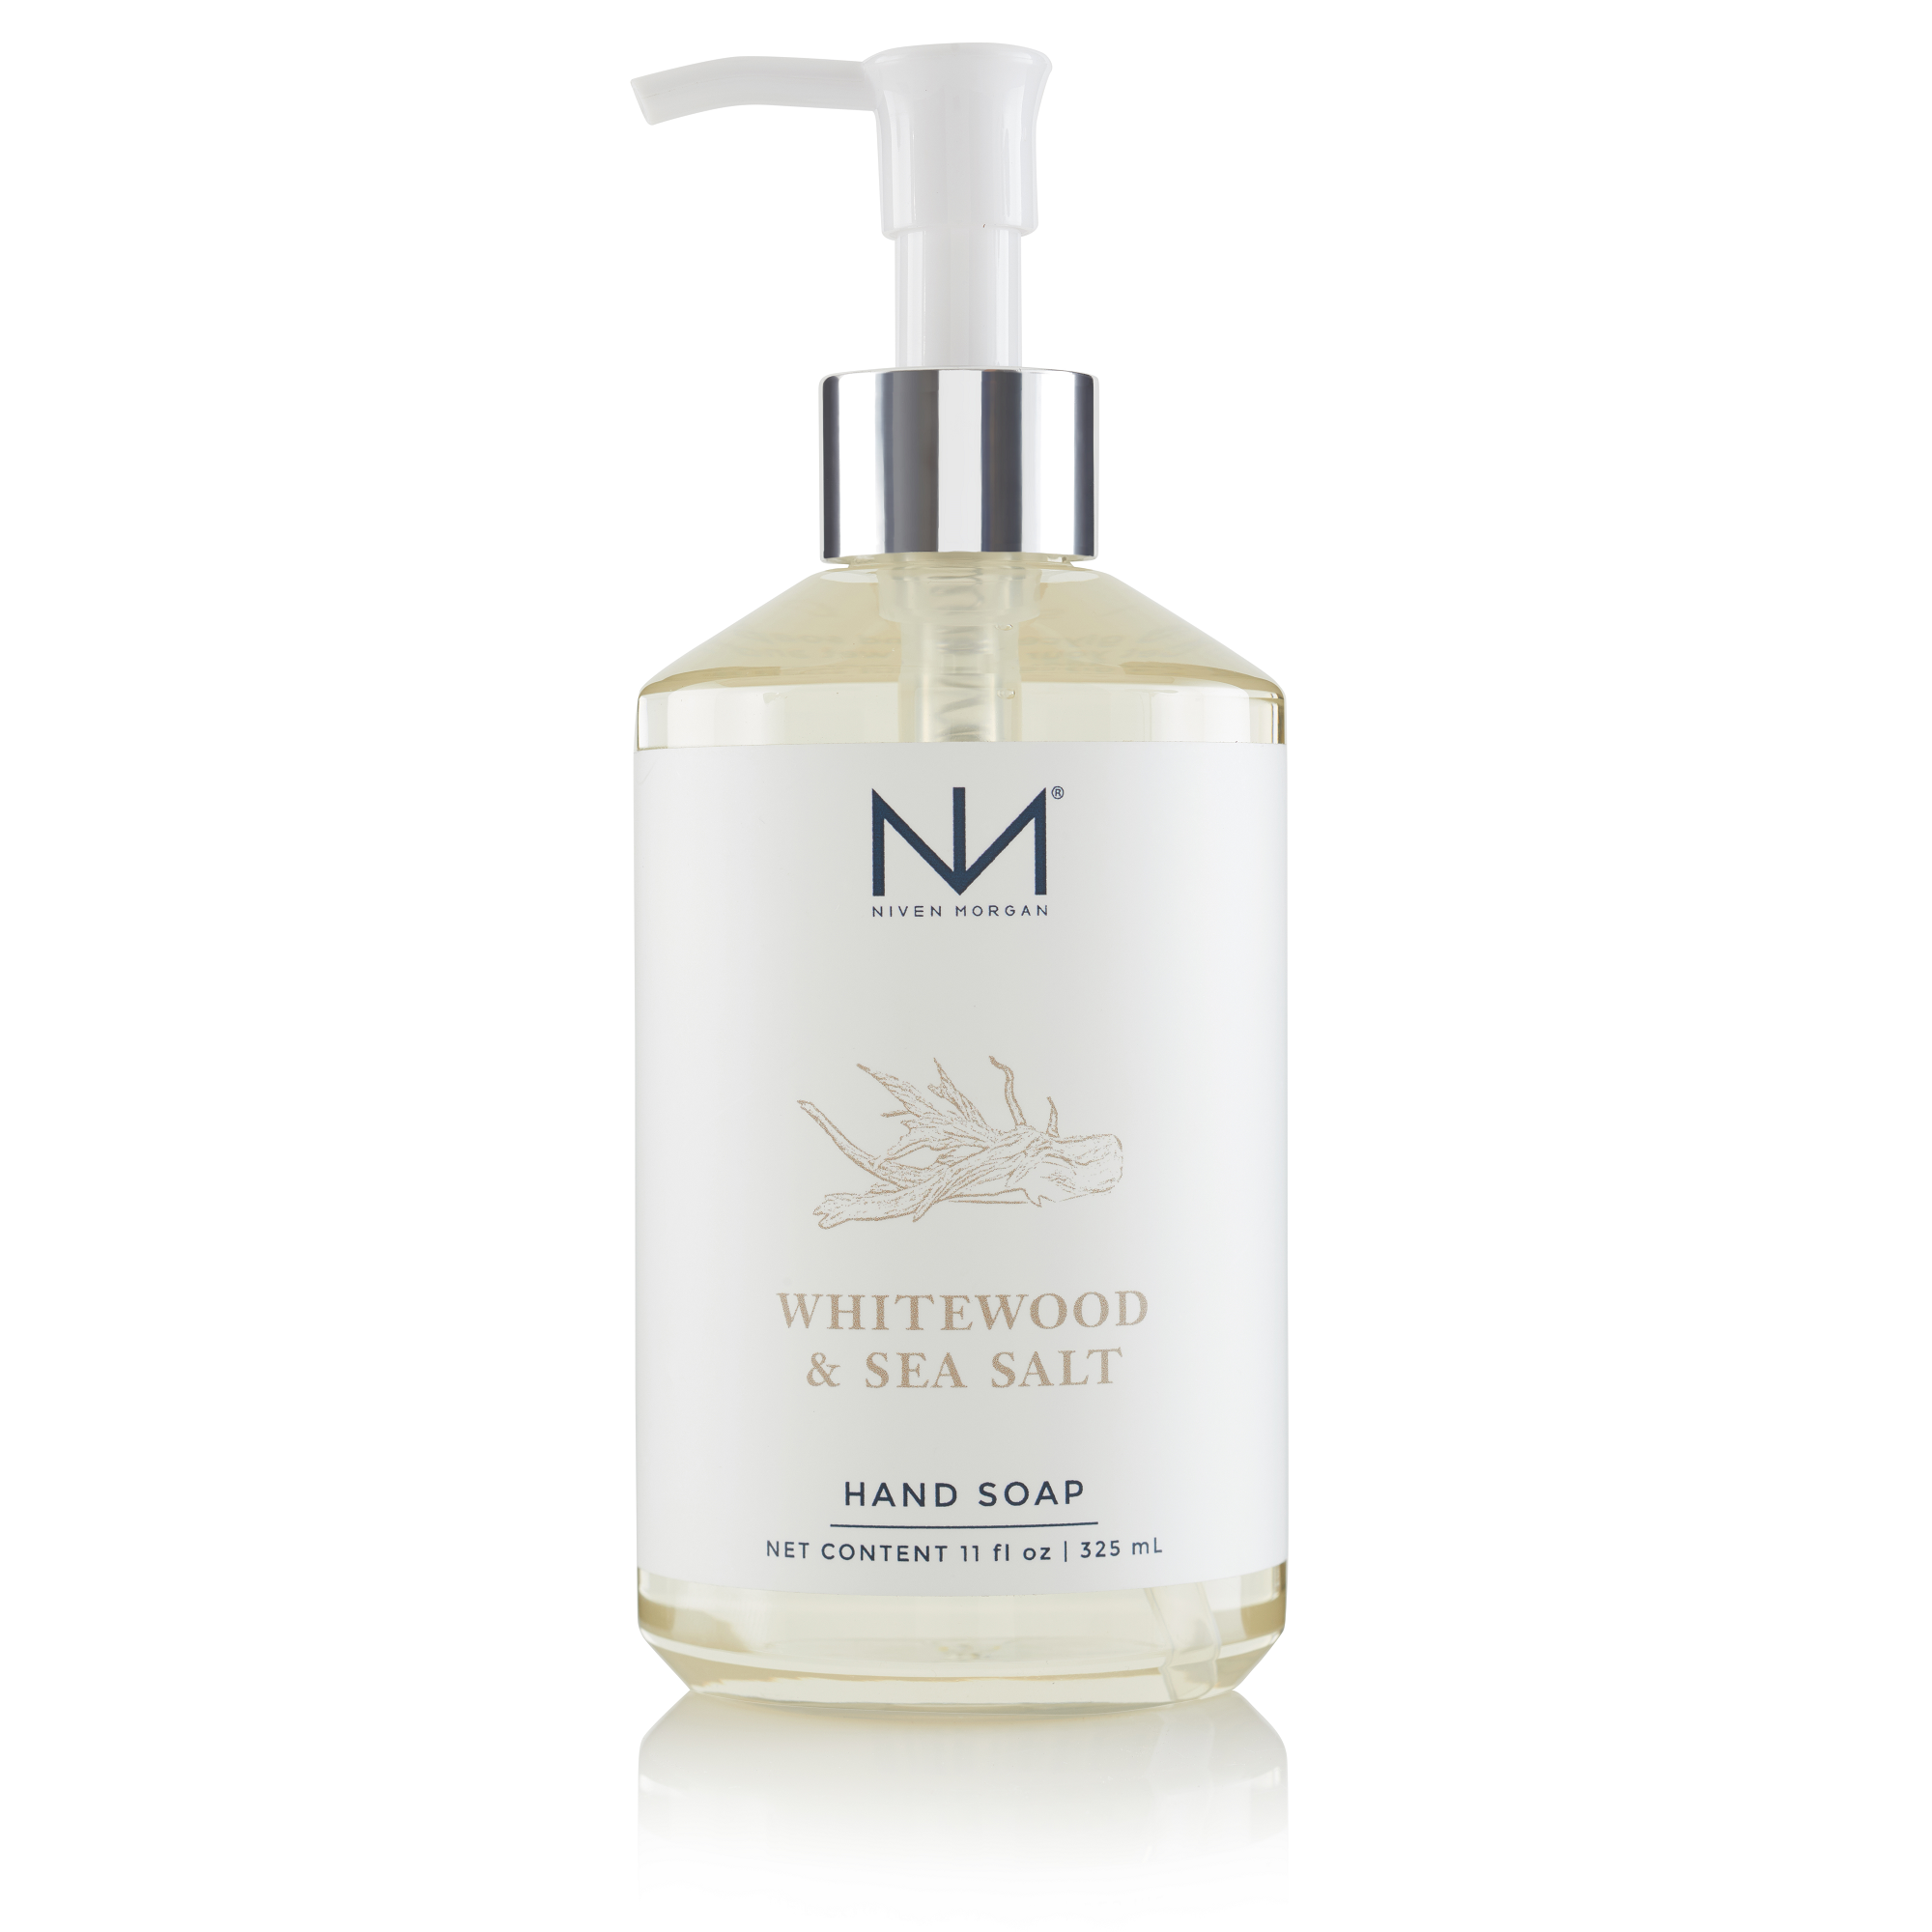 Niven Morgan Whitewood & Sea Salt Hand Soap